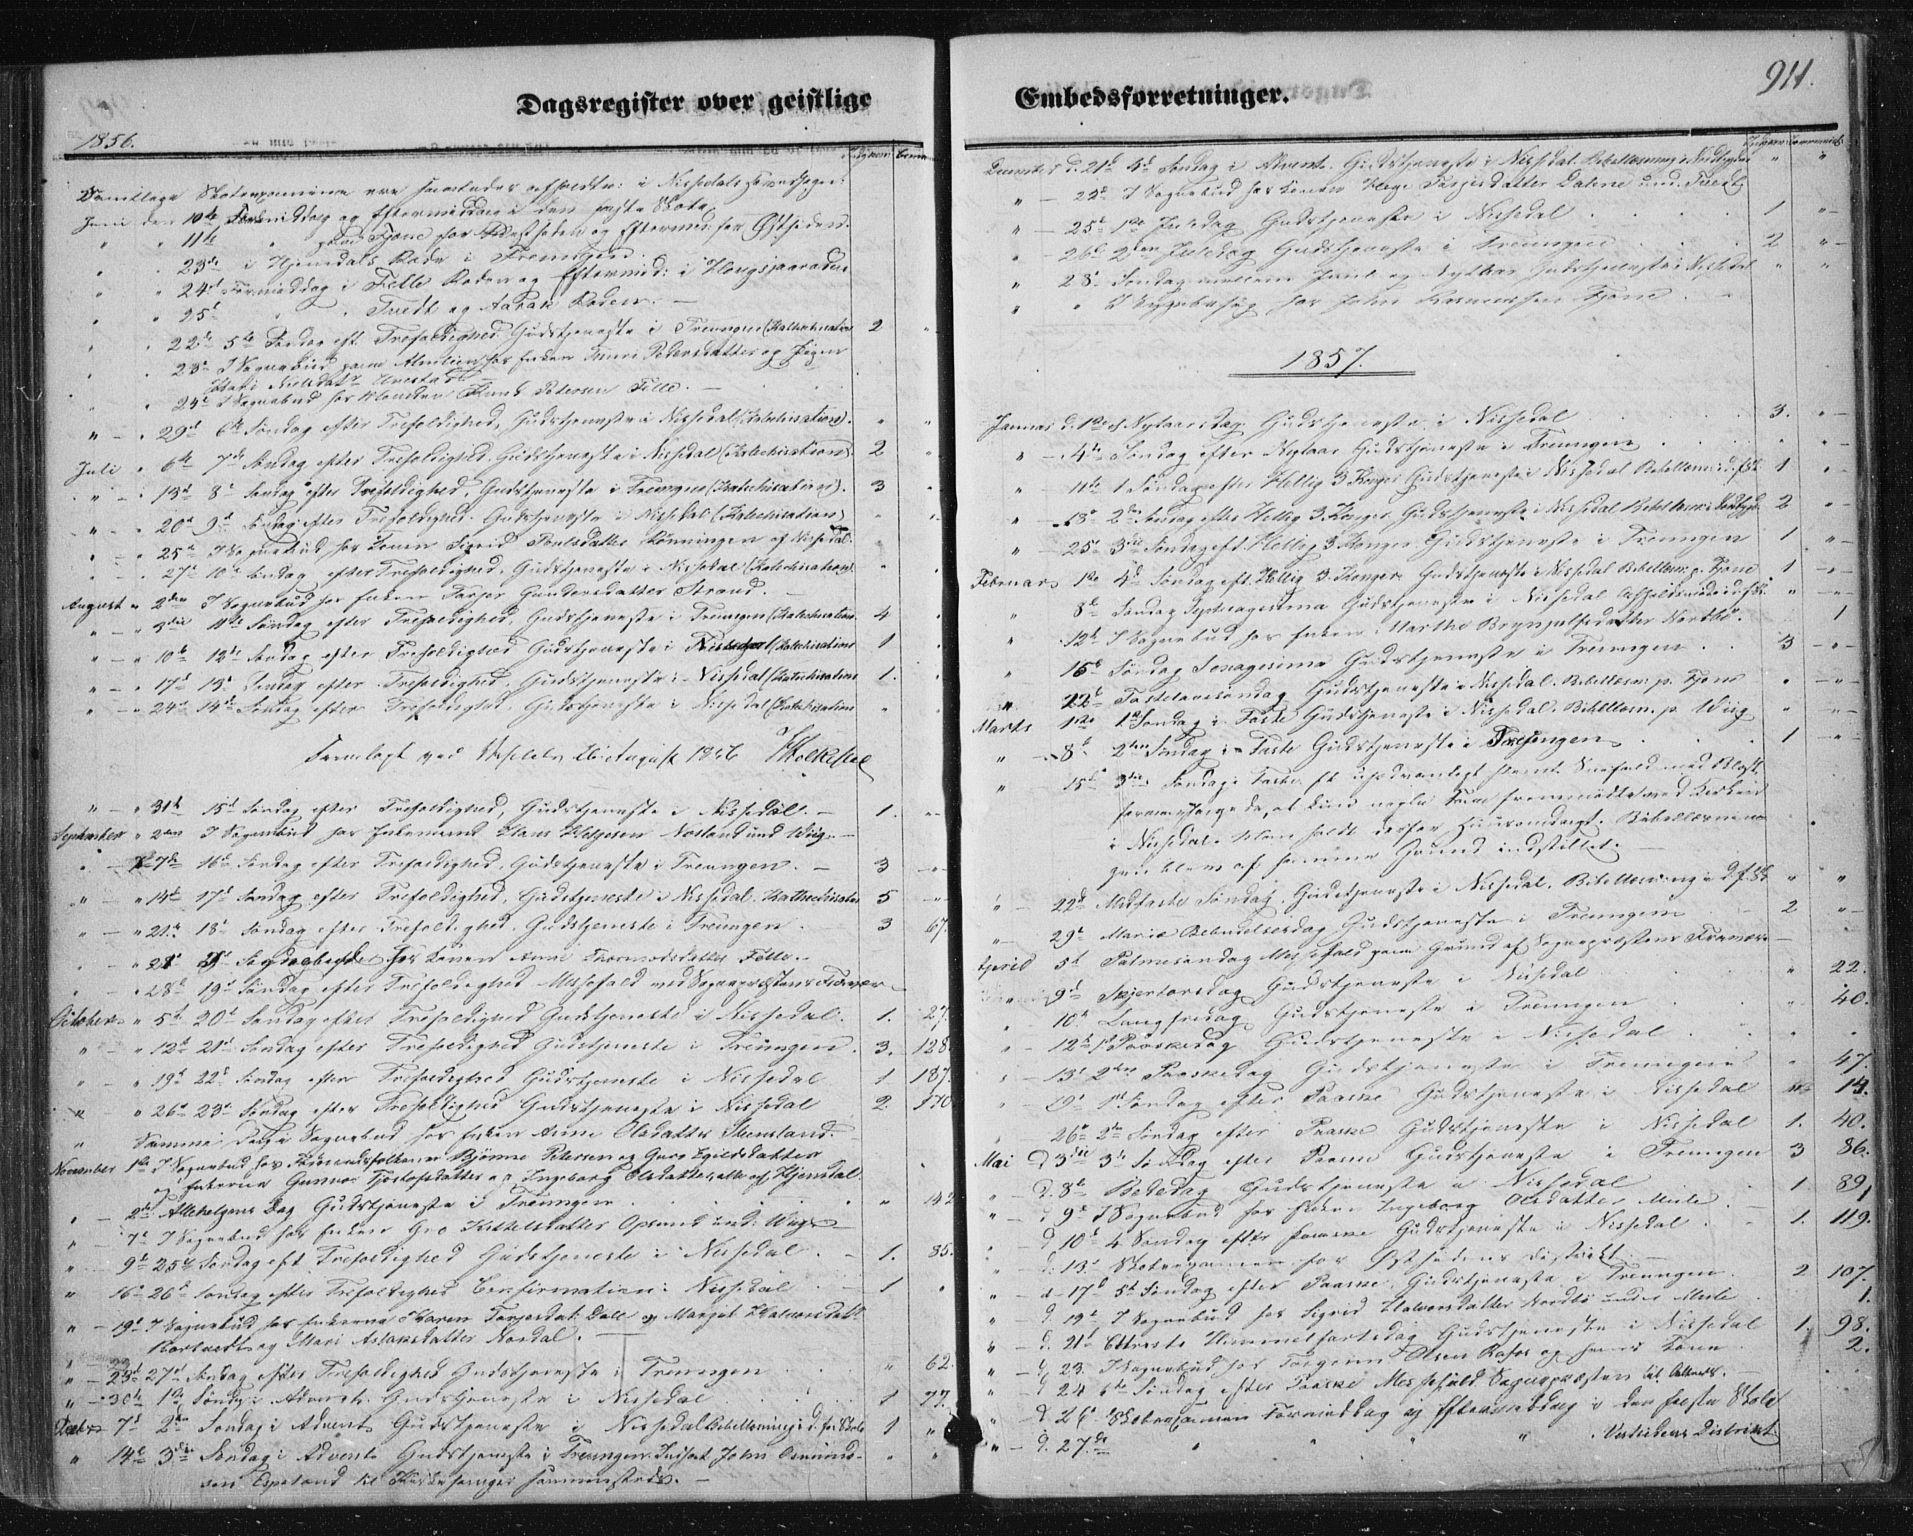 SAKO, Nissedal kirkebøker, F/Fa/L0003: Ministerialbok nr. I 3, 1846-1870, s. 910-911